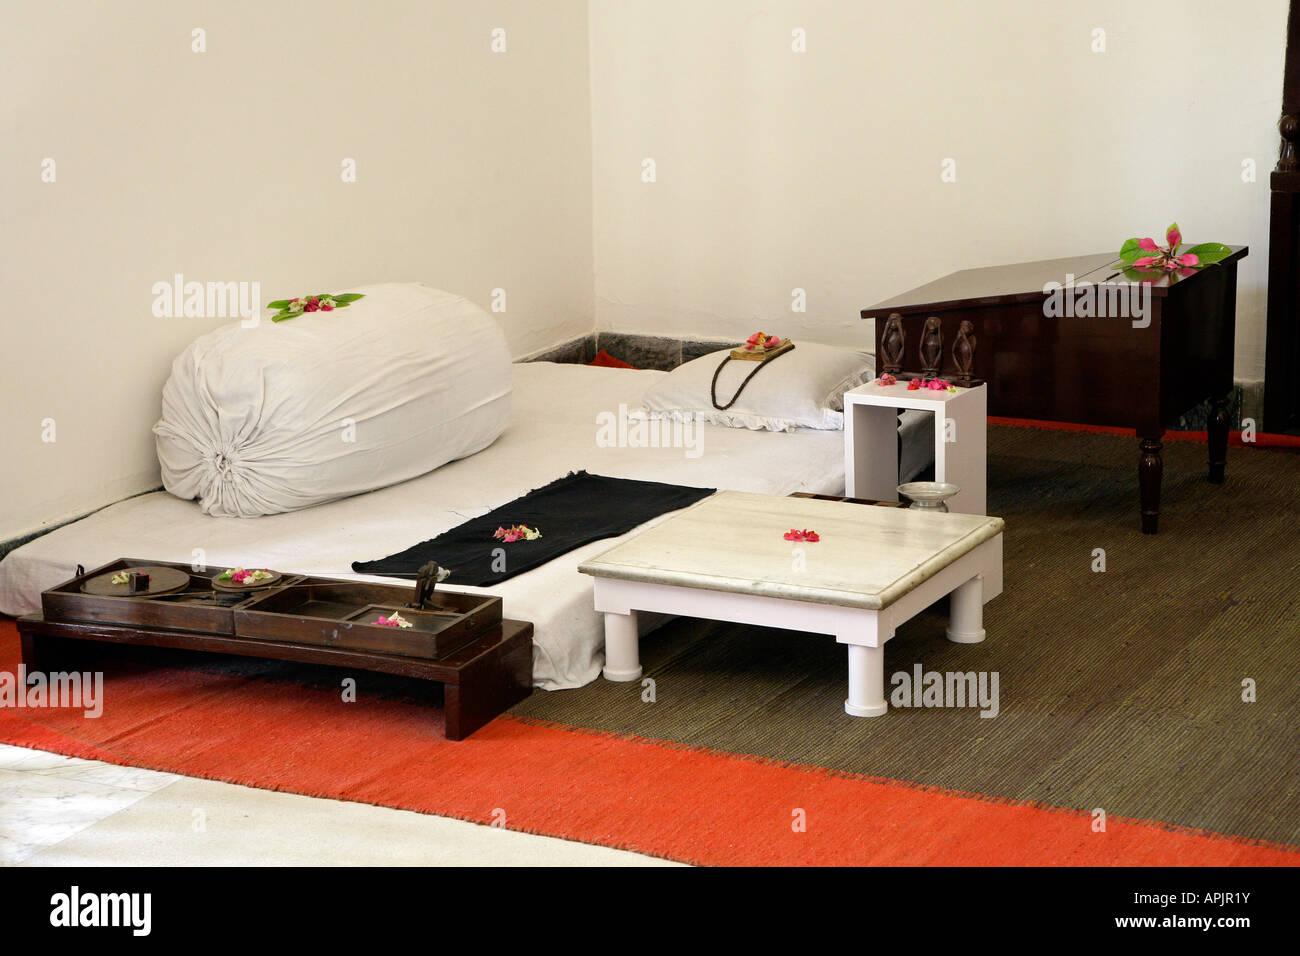 Gandhi's bedroom inside The Gandhi Museum, Delhi, Uttar Pradesh, India - Stock Image